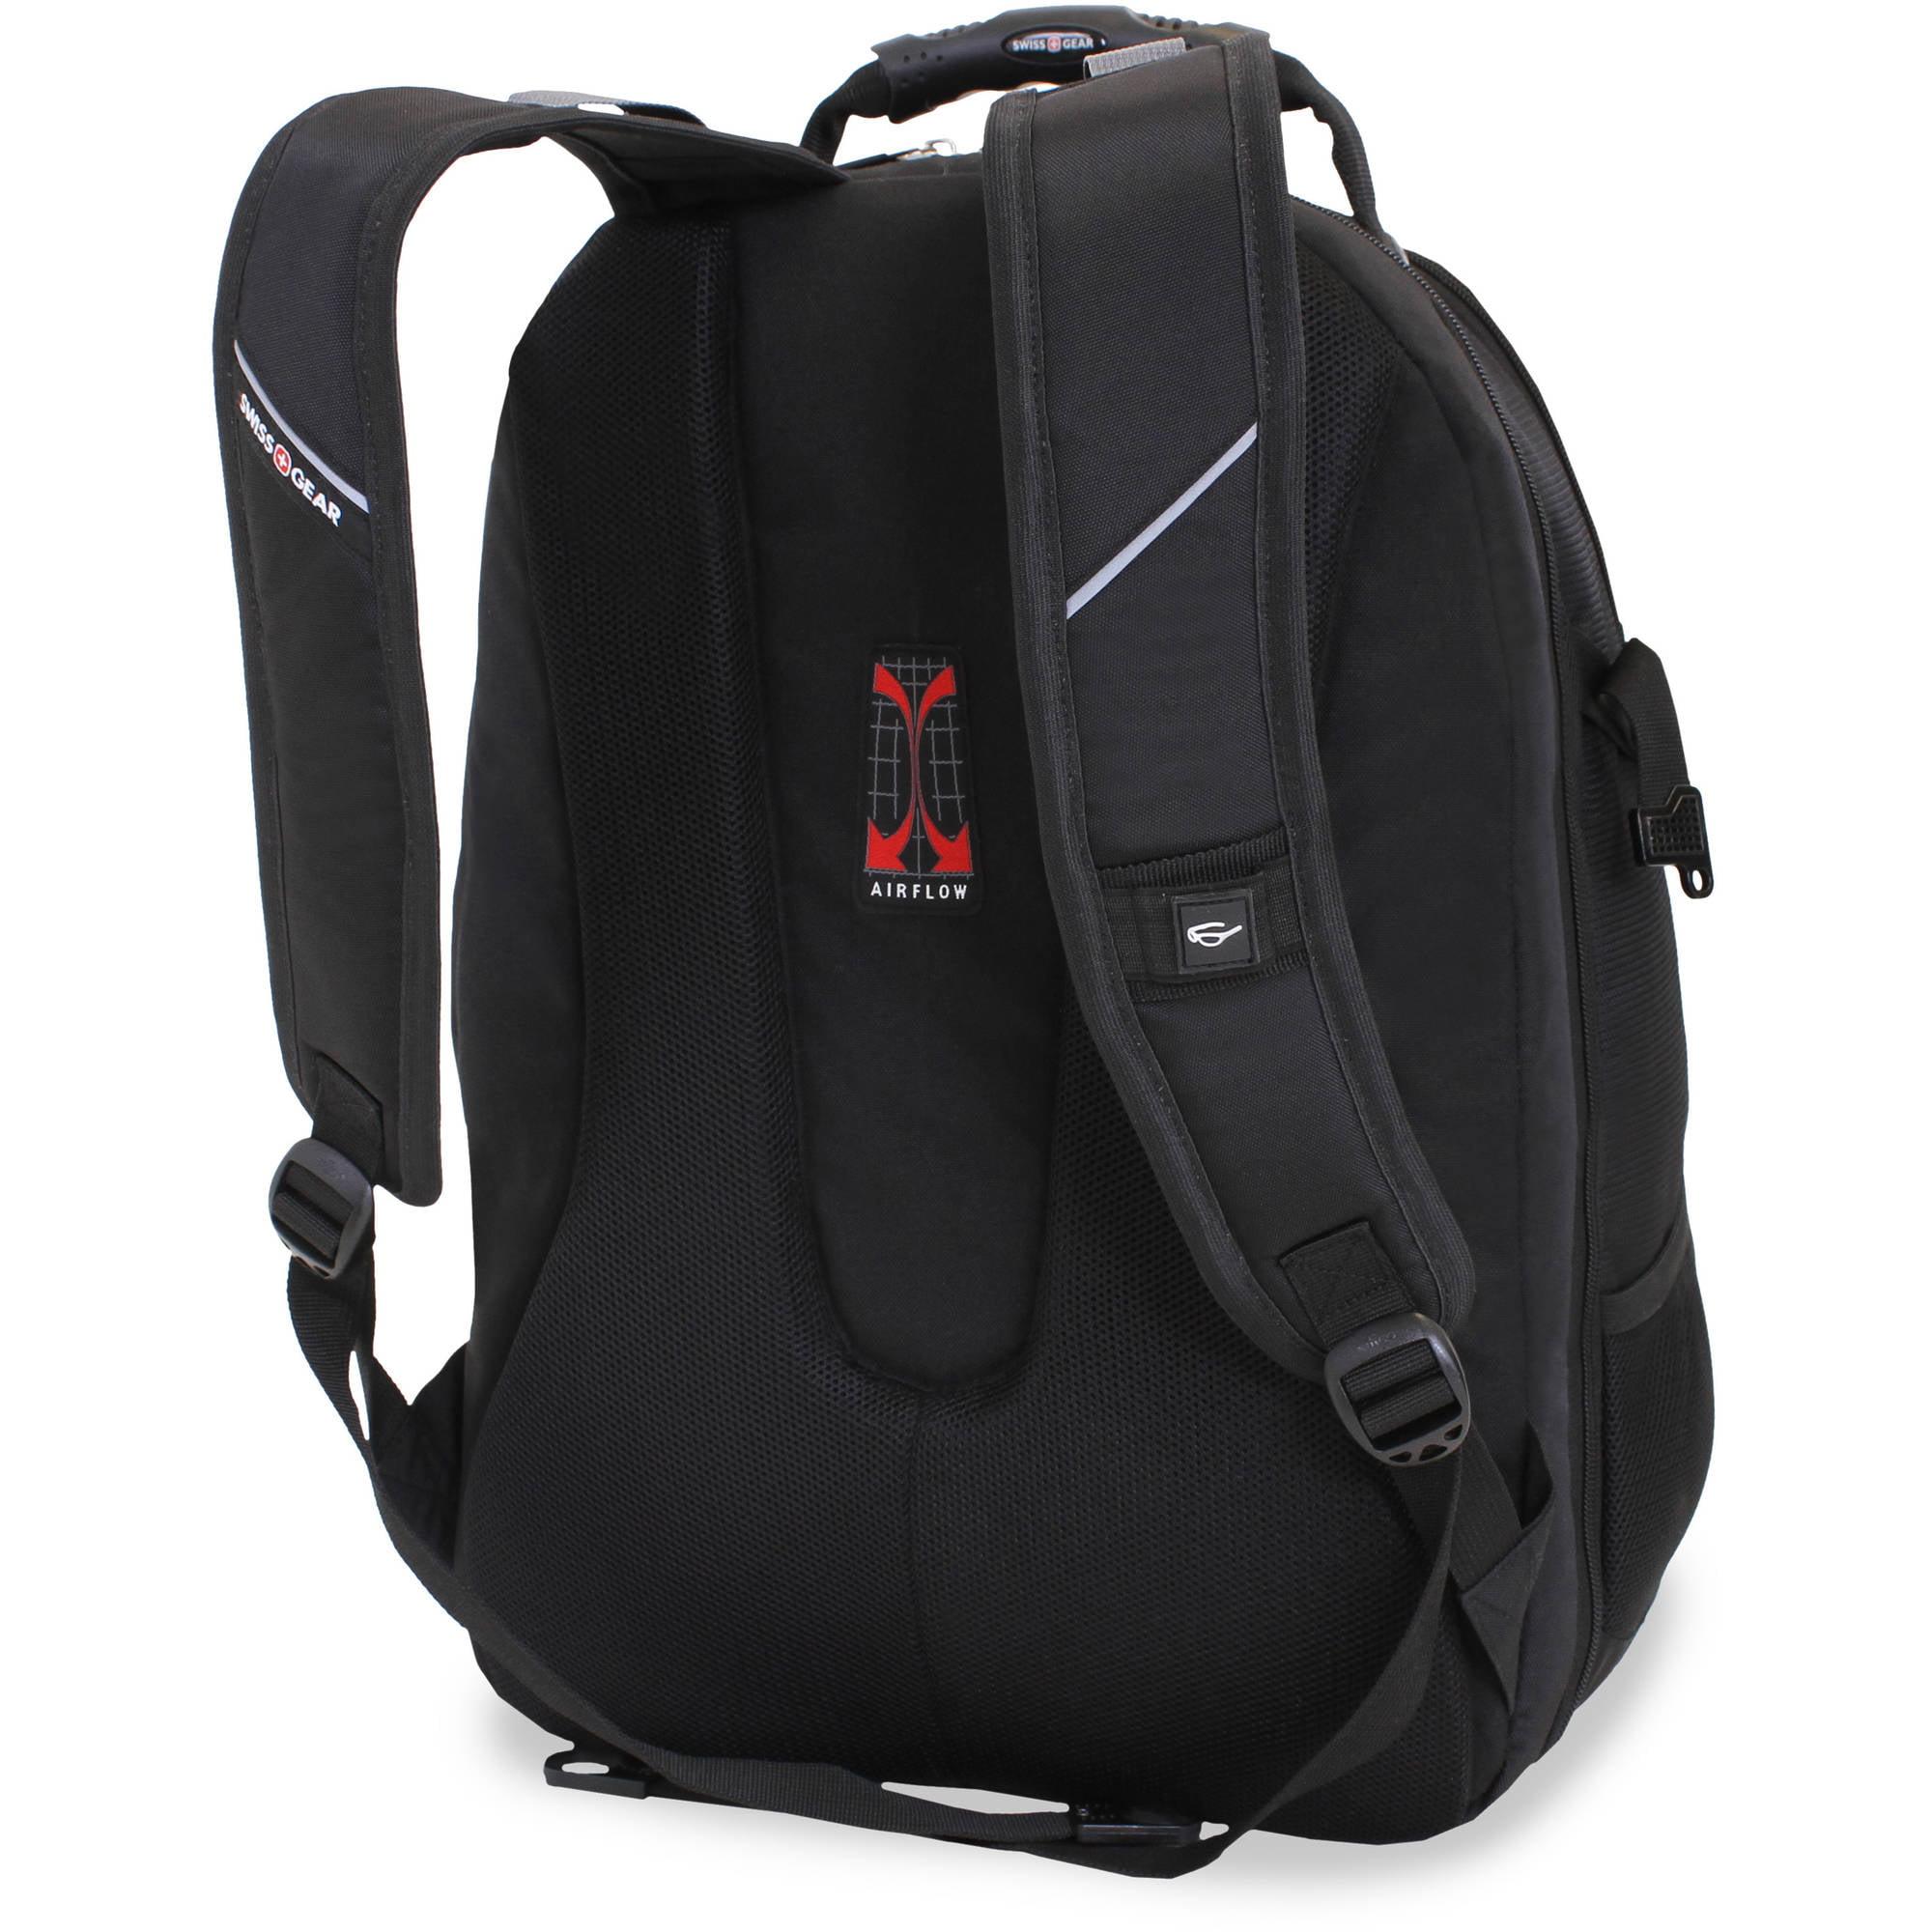 Swiss SA3239 Computer Backpack - Walmart.com